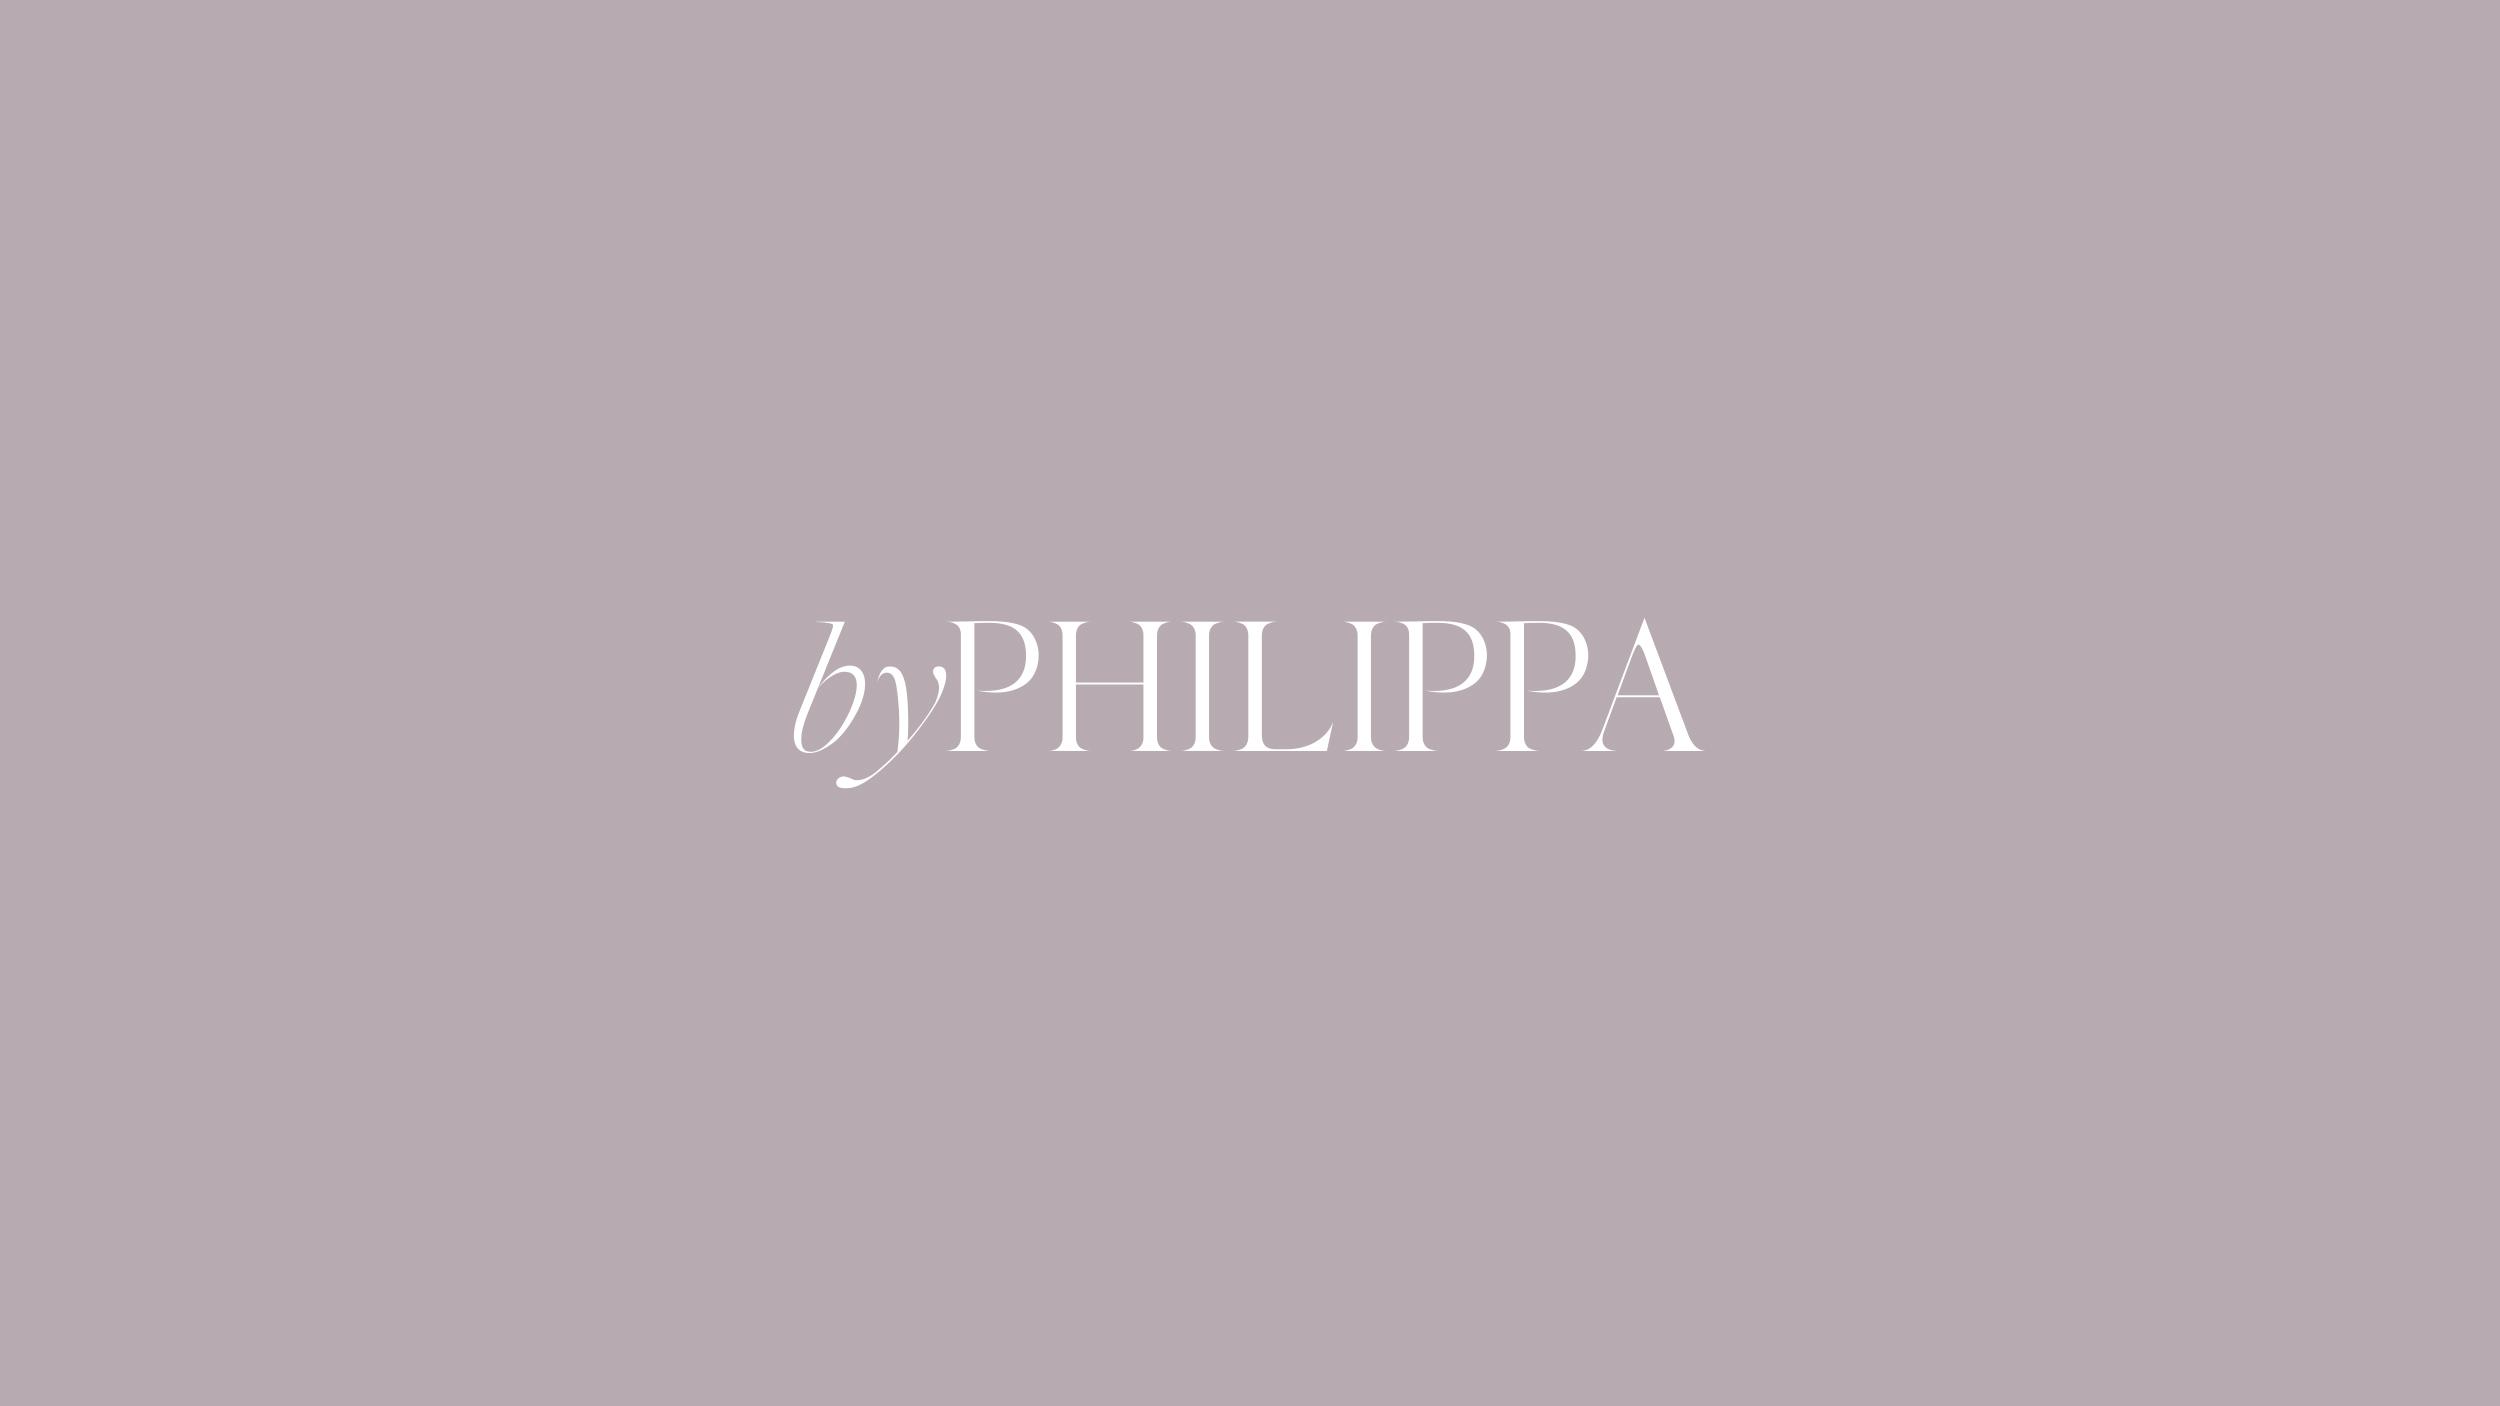 byphilippa02.jpg